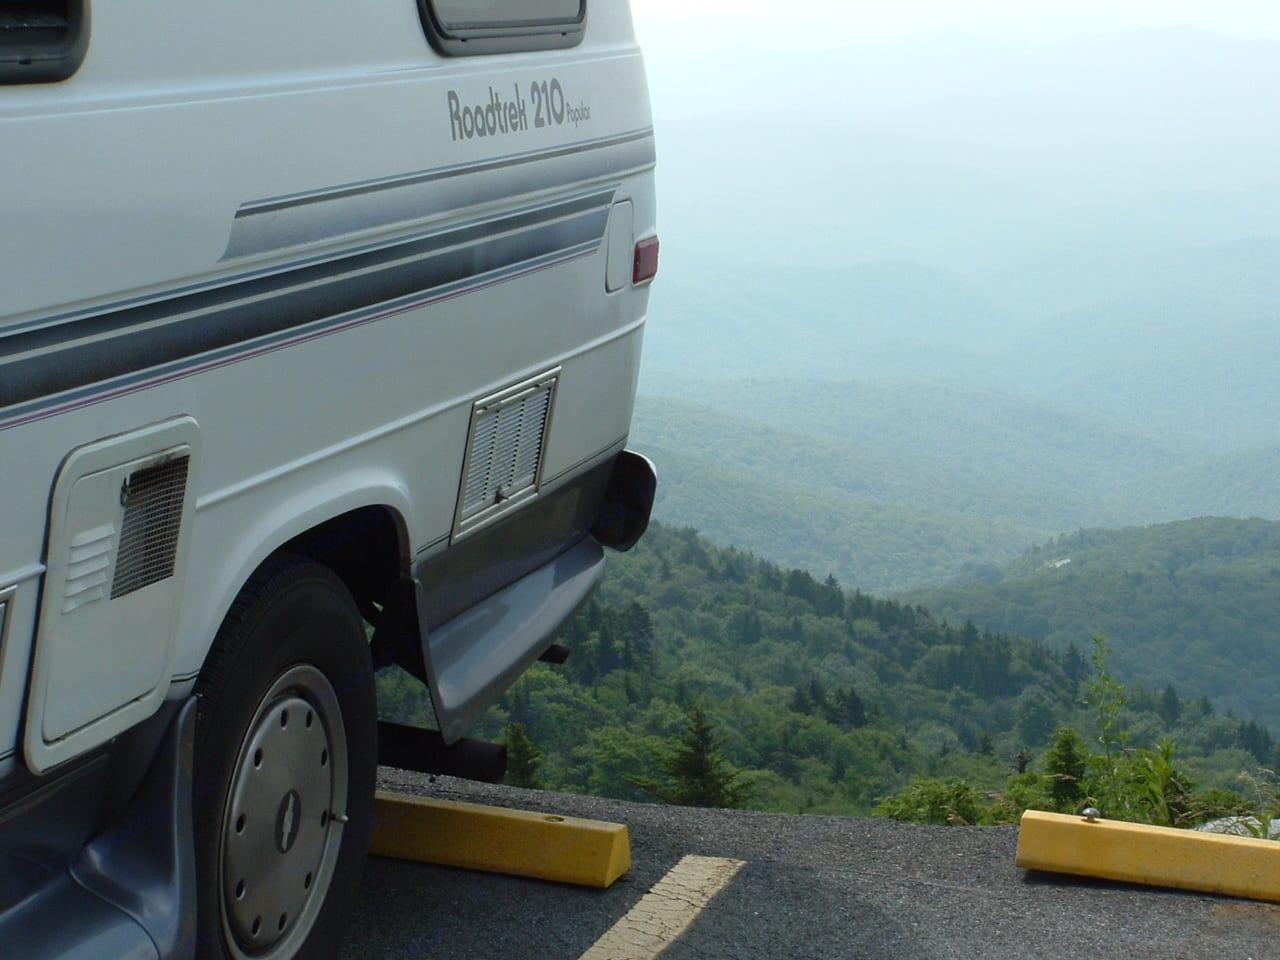 Roadtrek 210 - Popular 1995